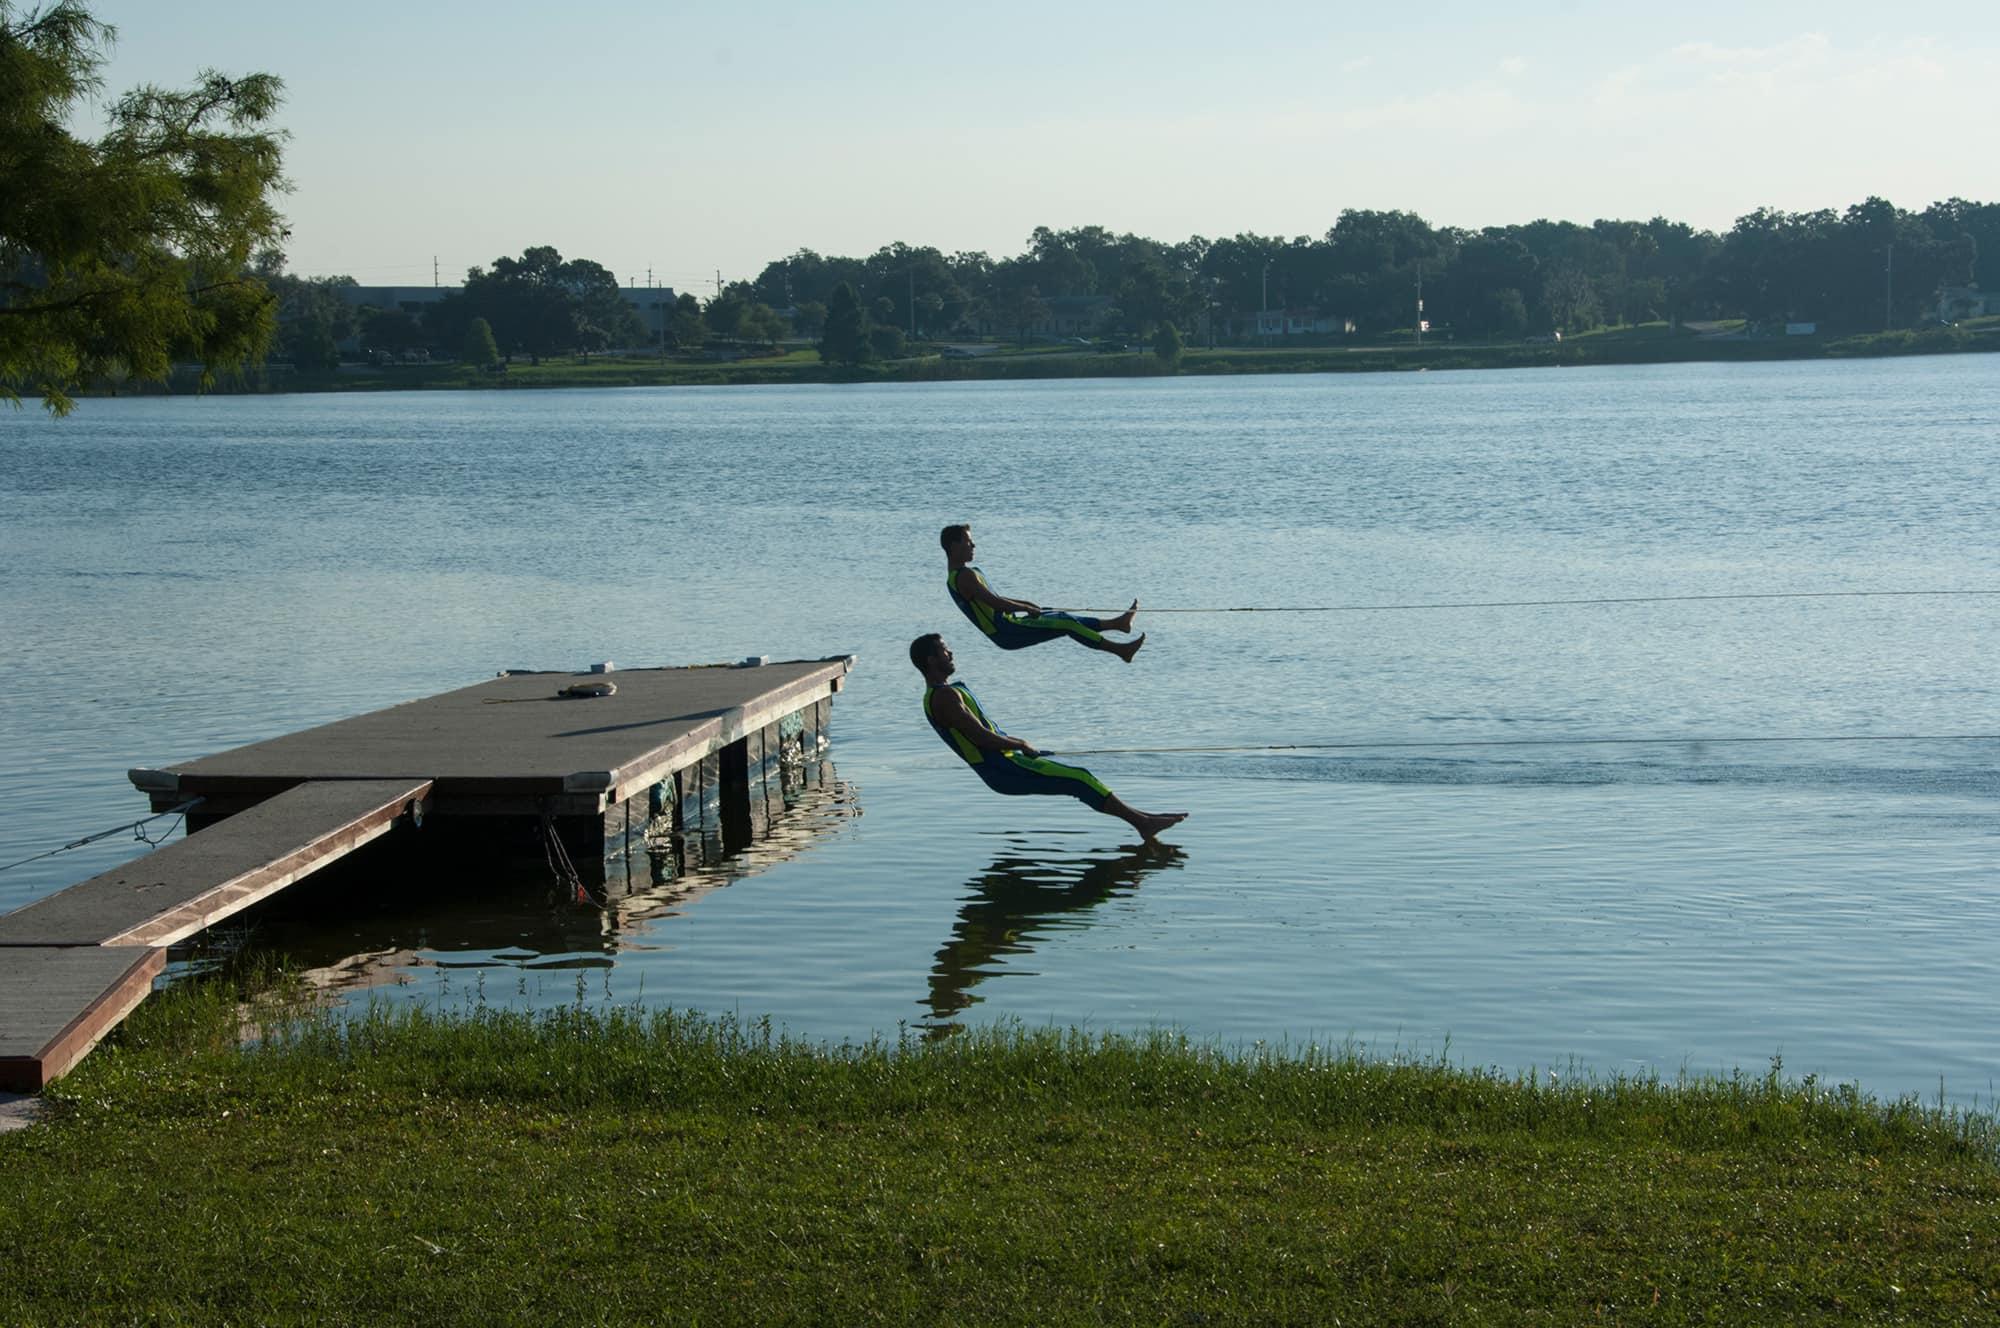 2 barefoot water skiers jumping from platform onto lake